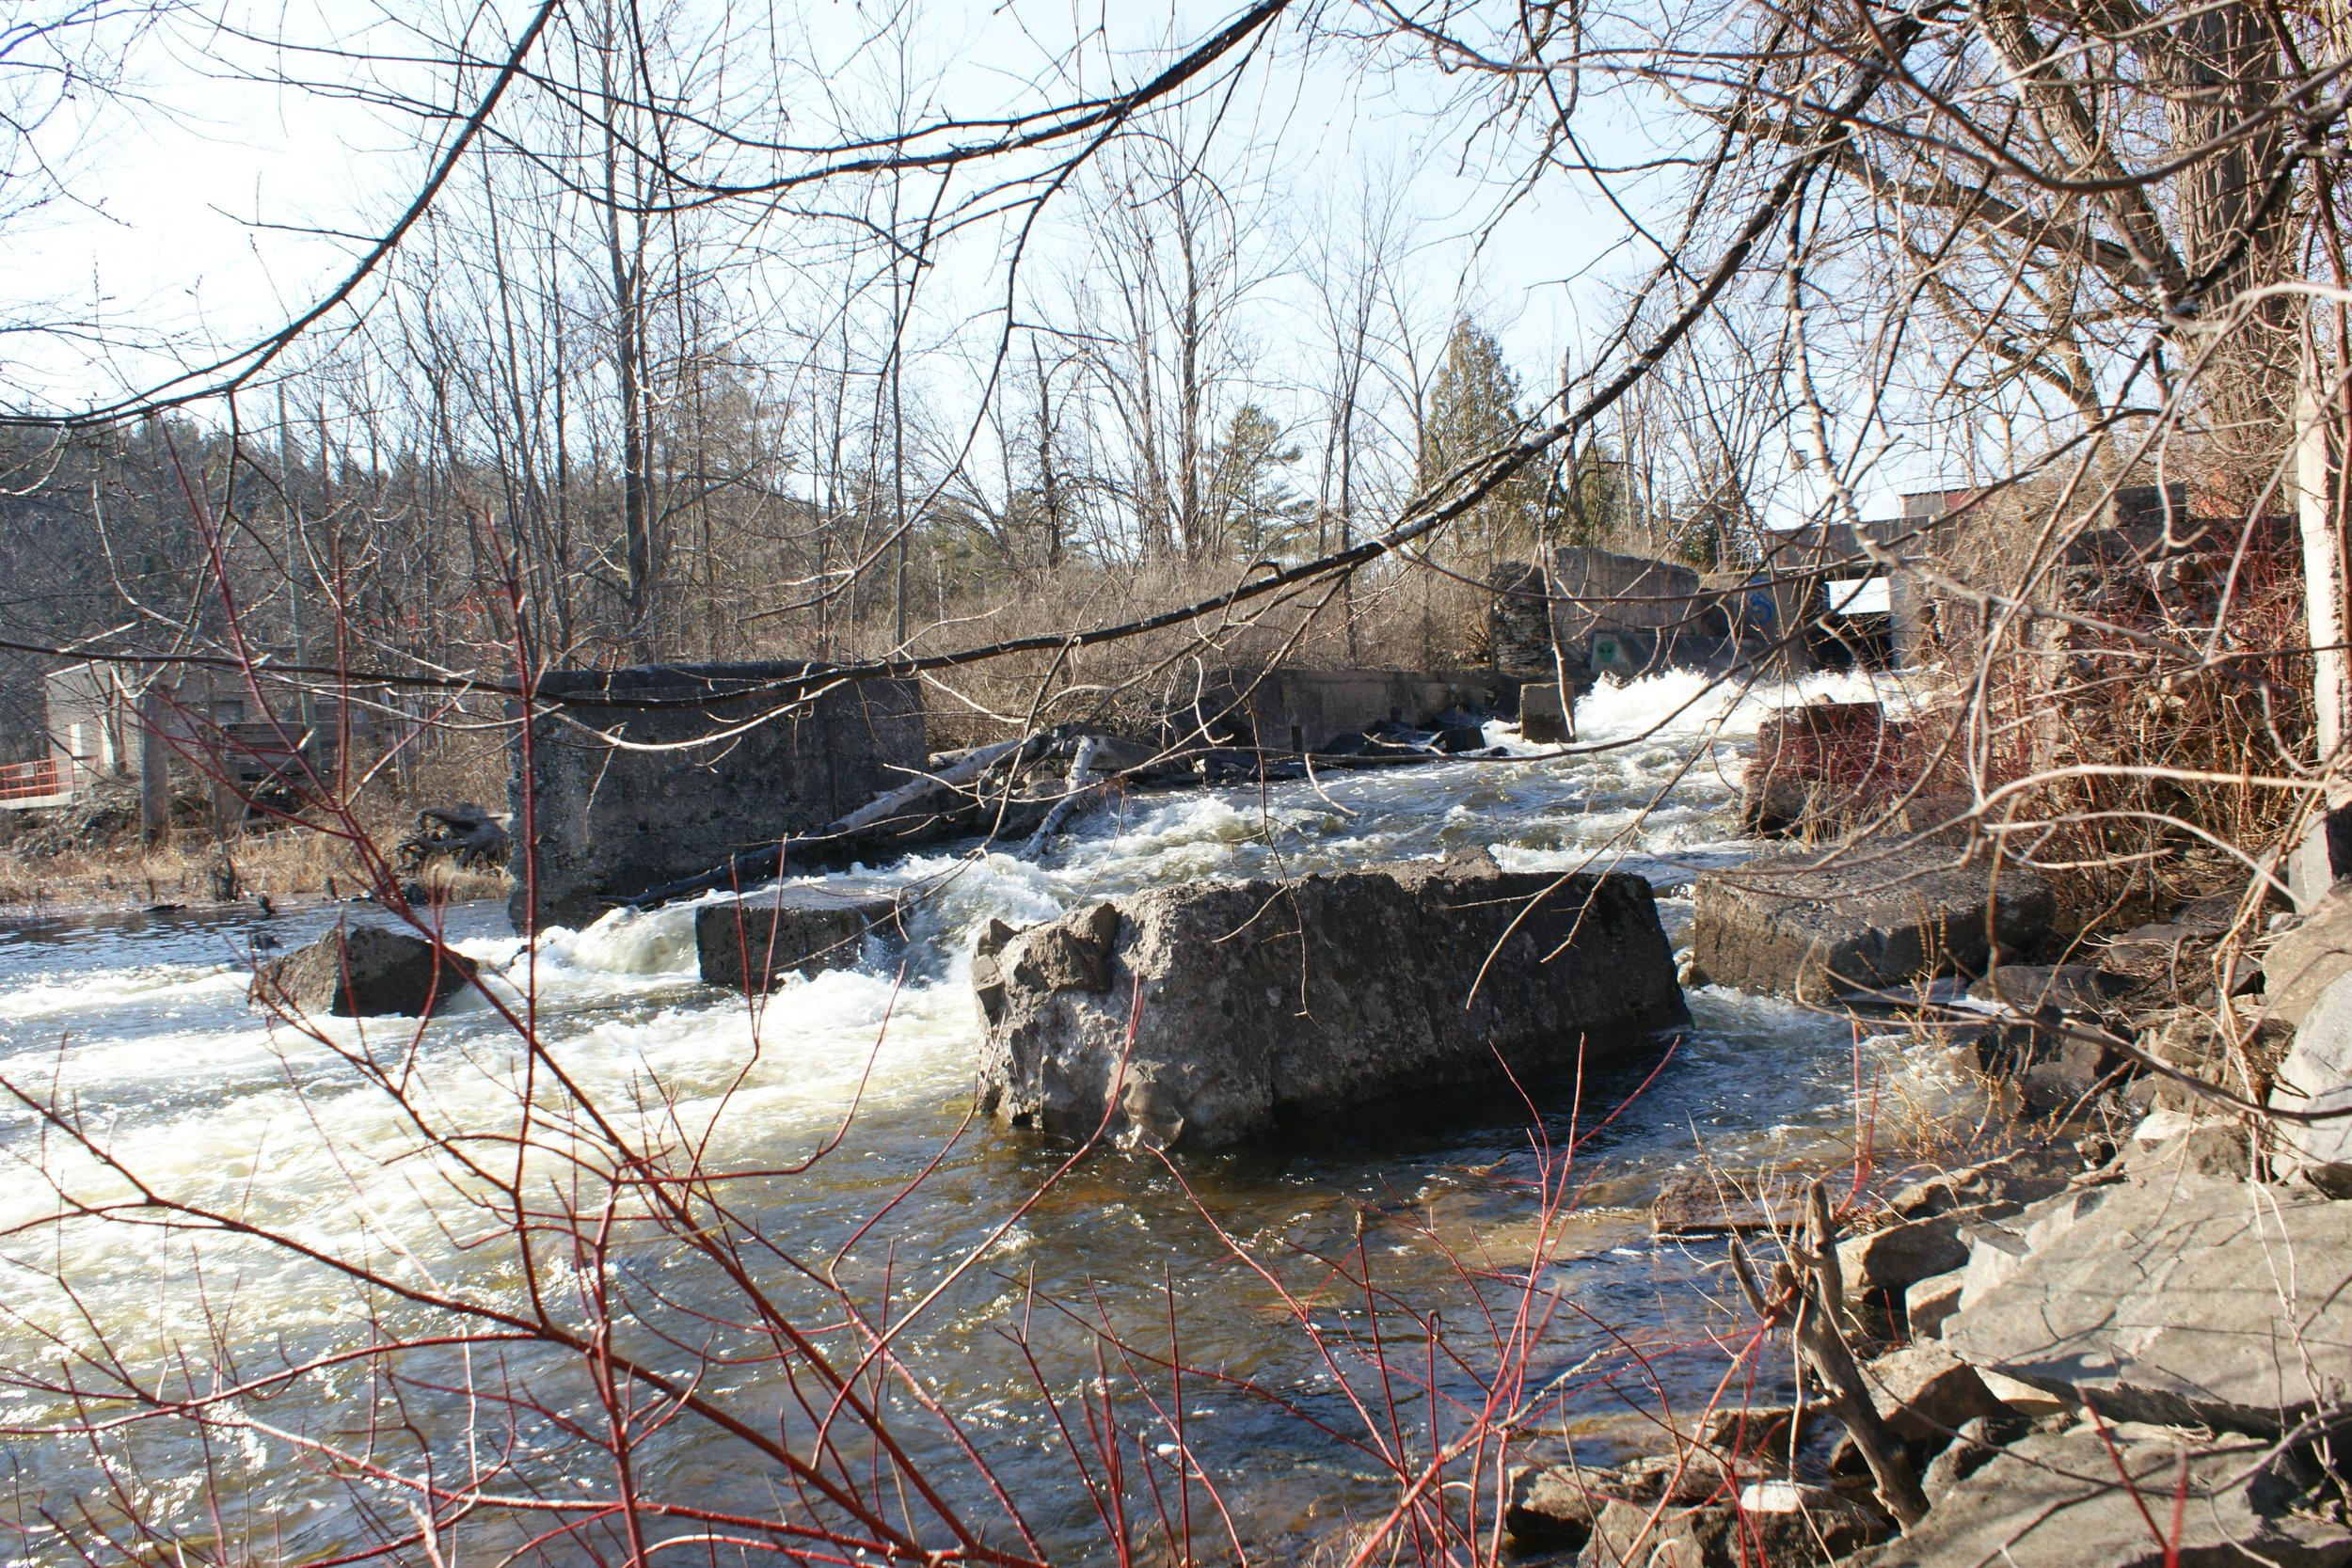 Water chute for sawmill